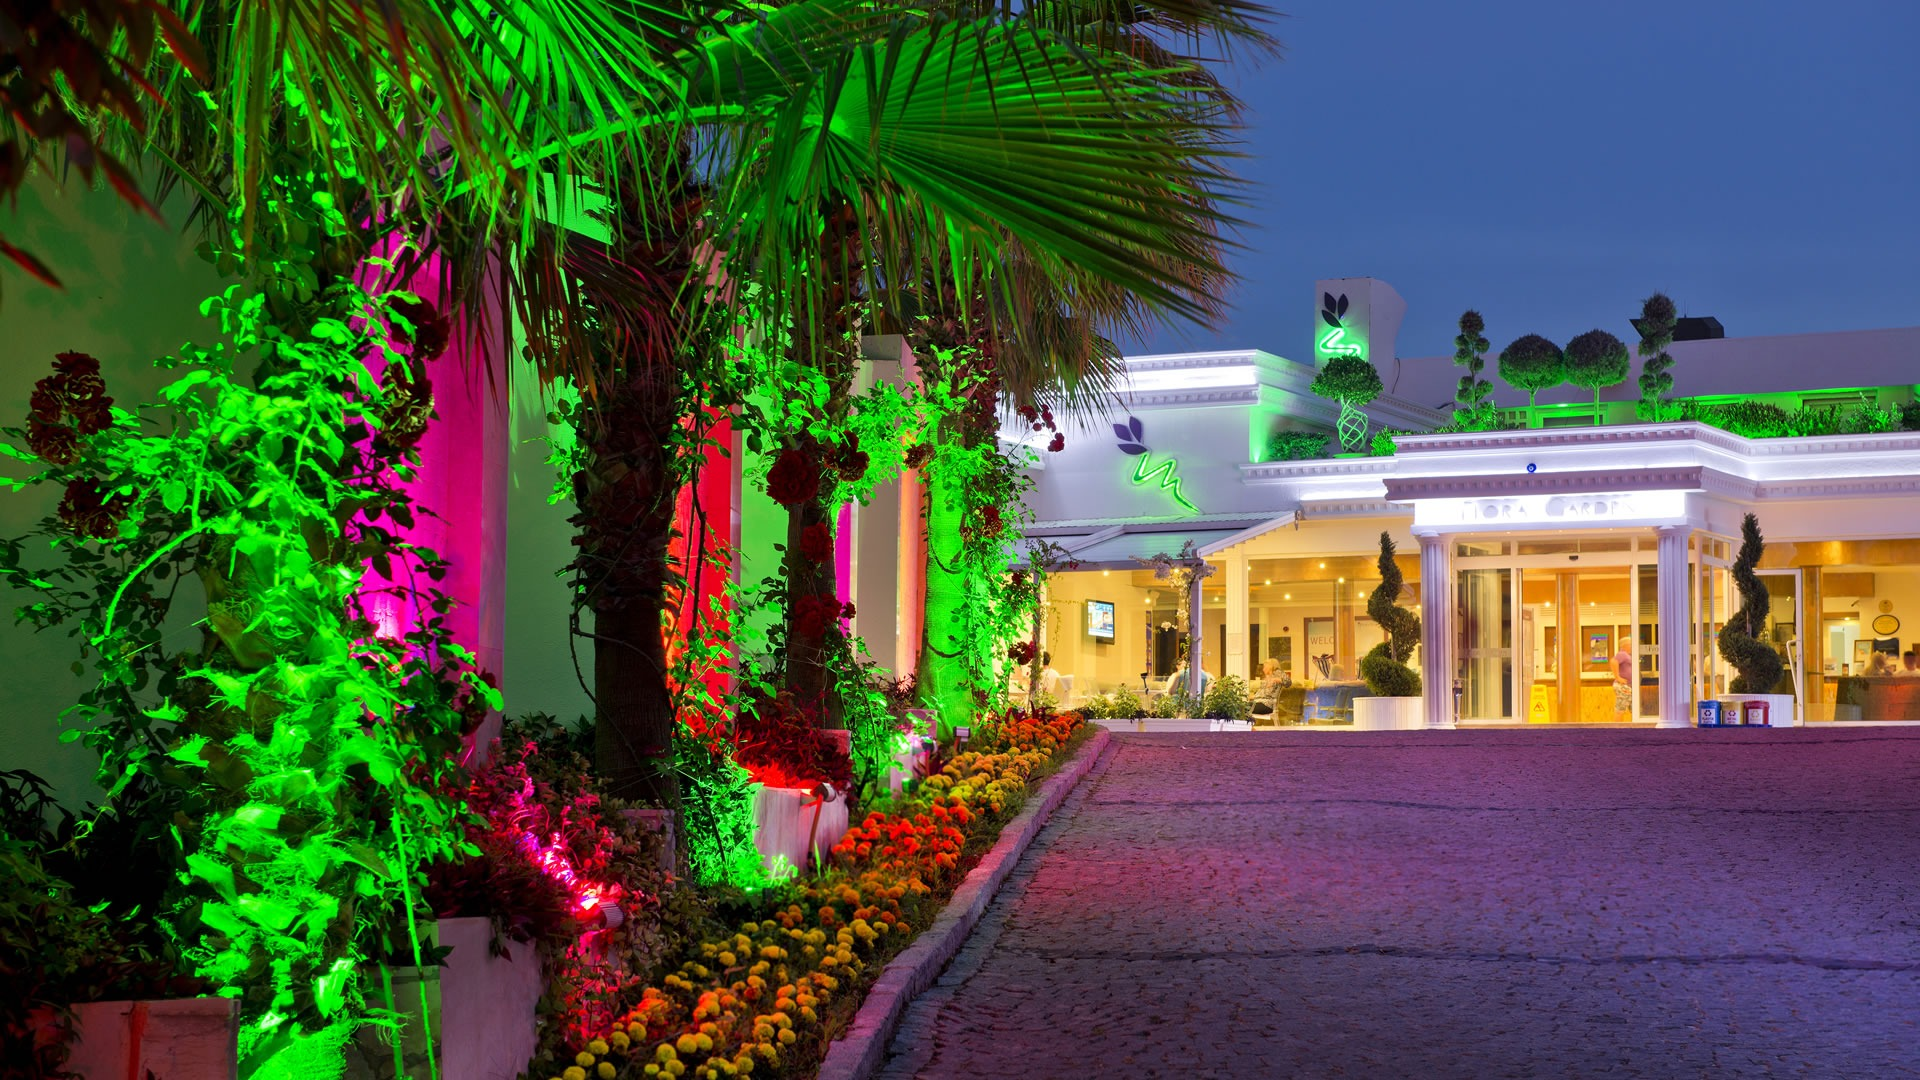 Flora Garden Beach Club Hotel, - TRIPinVIEW